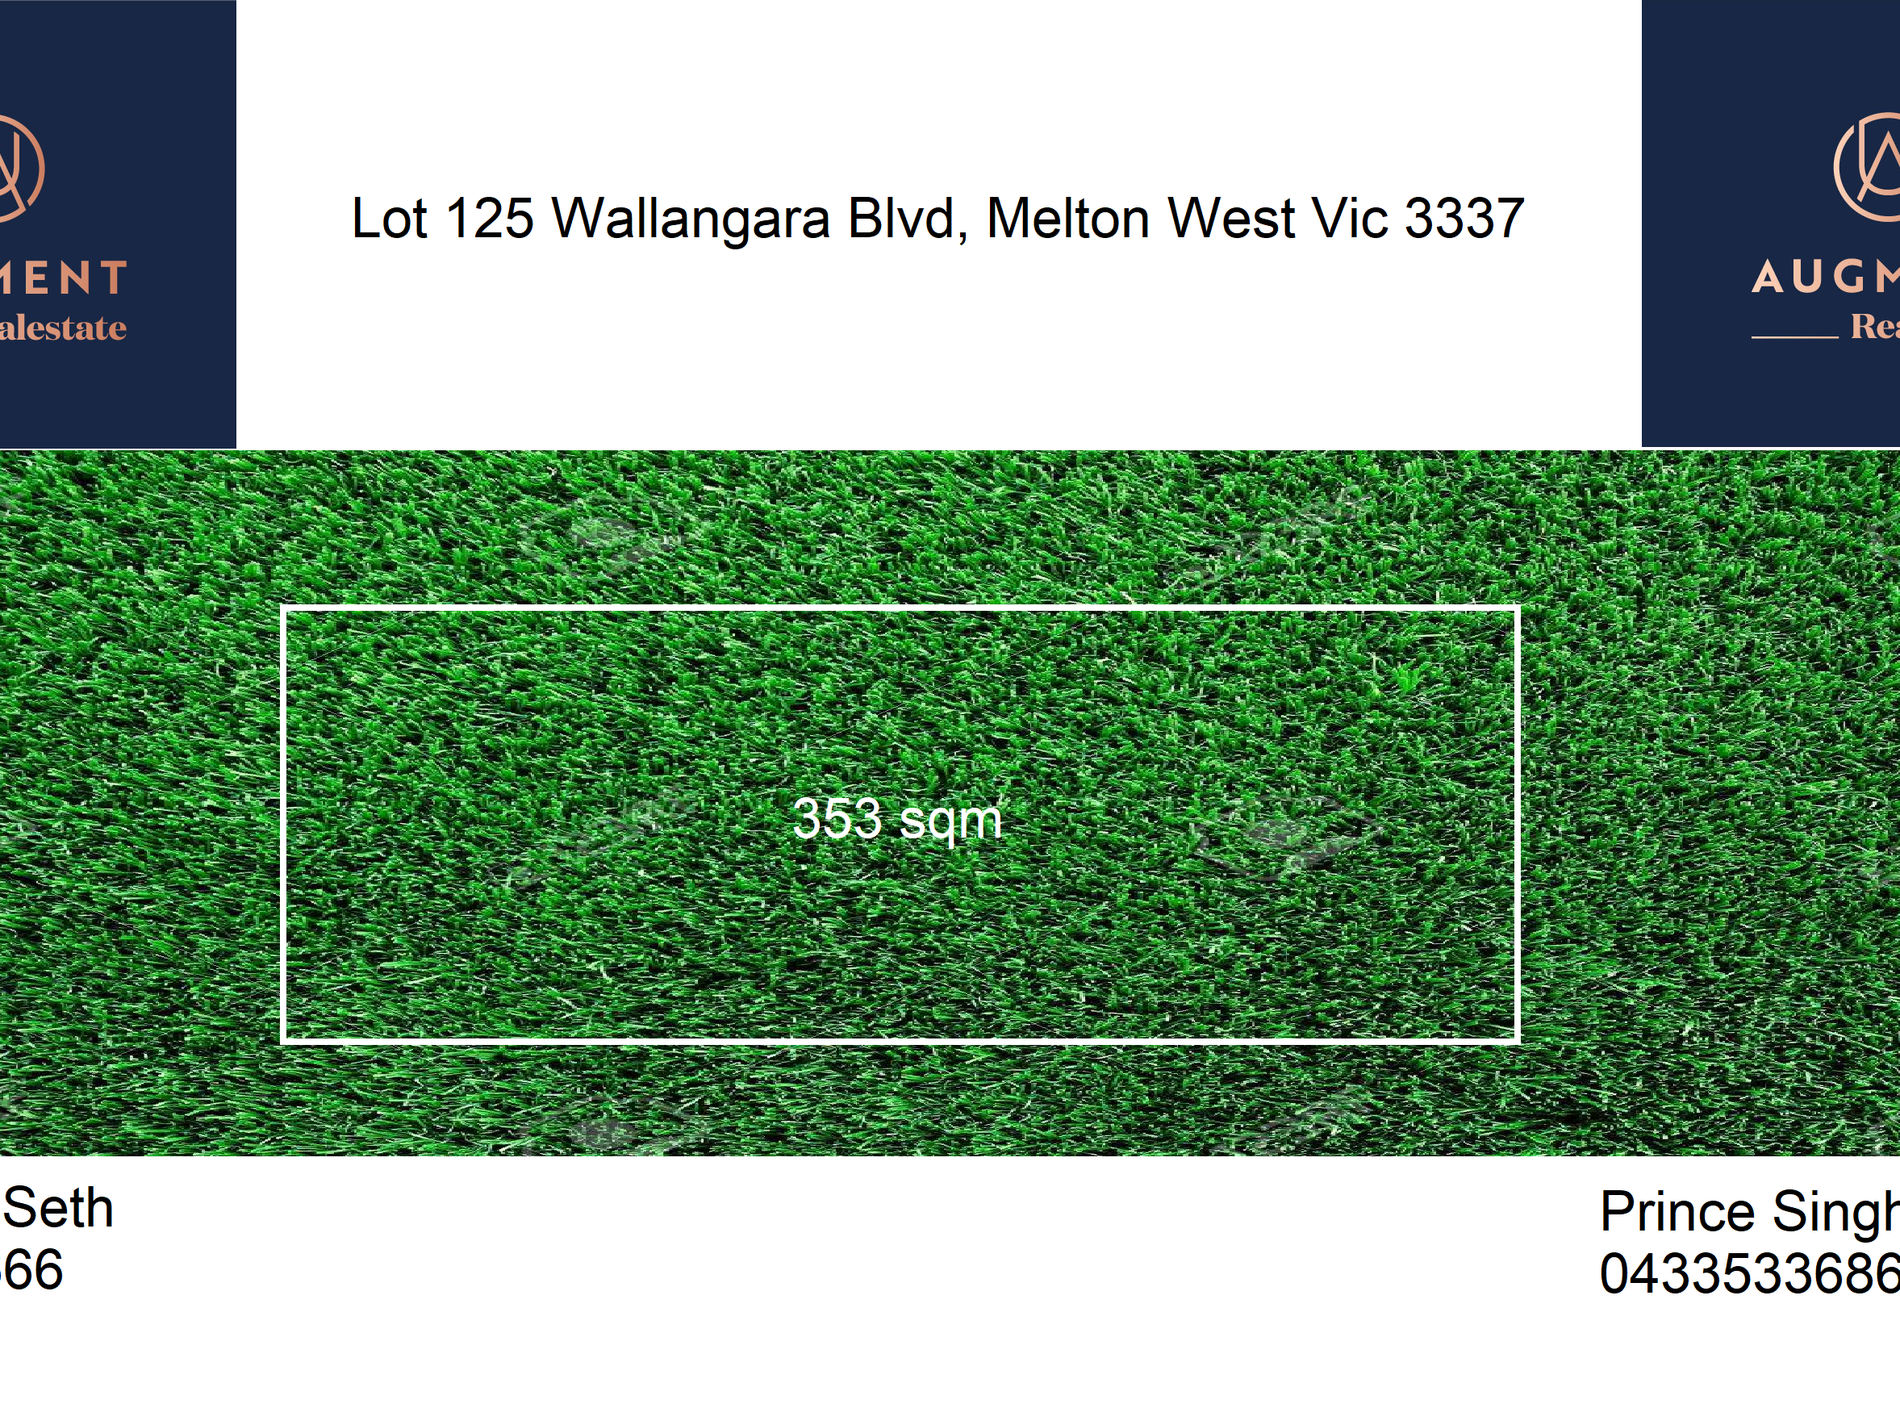 Lot 125, Wallangara Blvd, Melton West